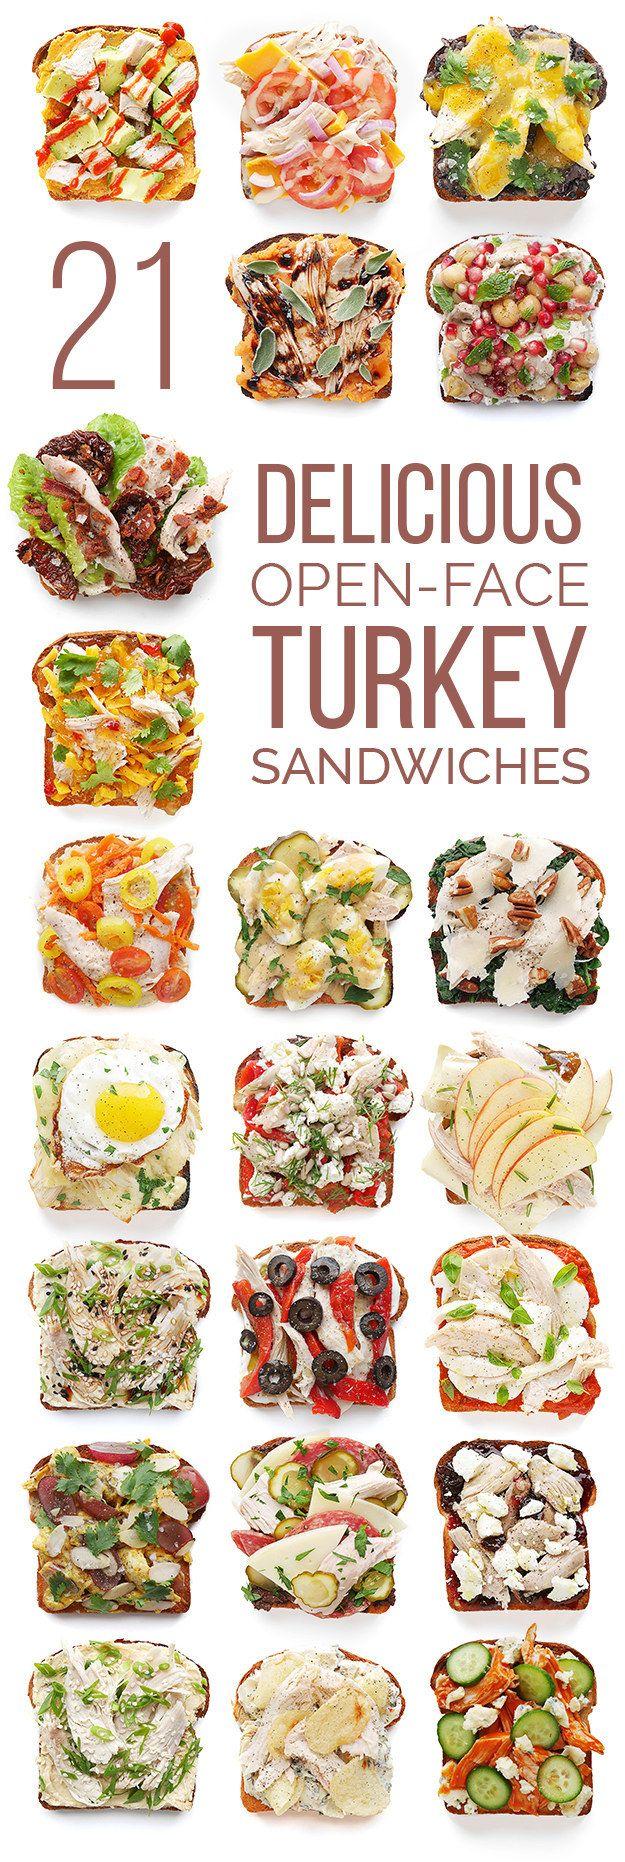 Toast + Thanksgiving Leftovers = Heaven.